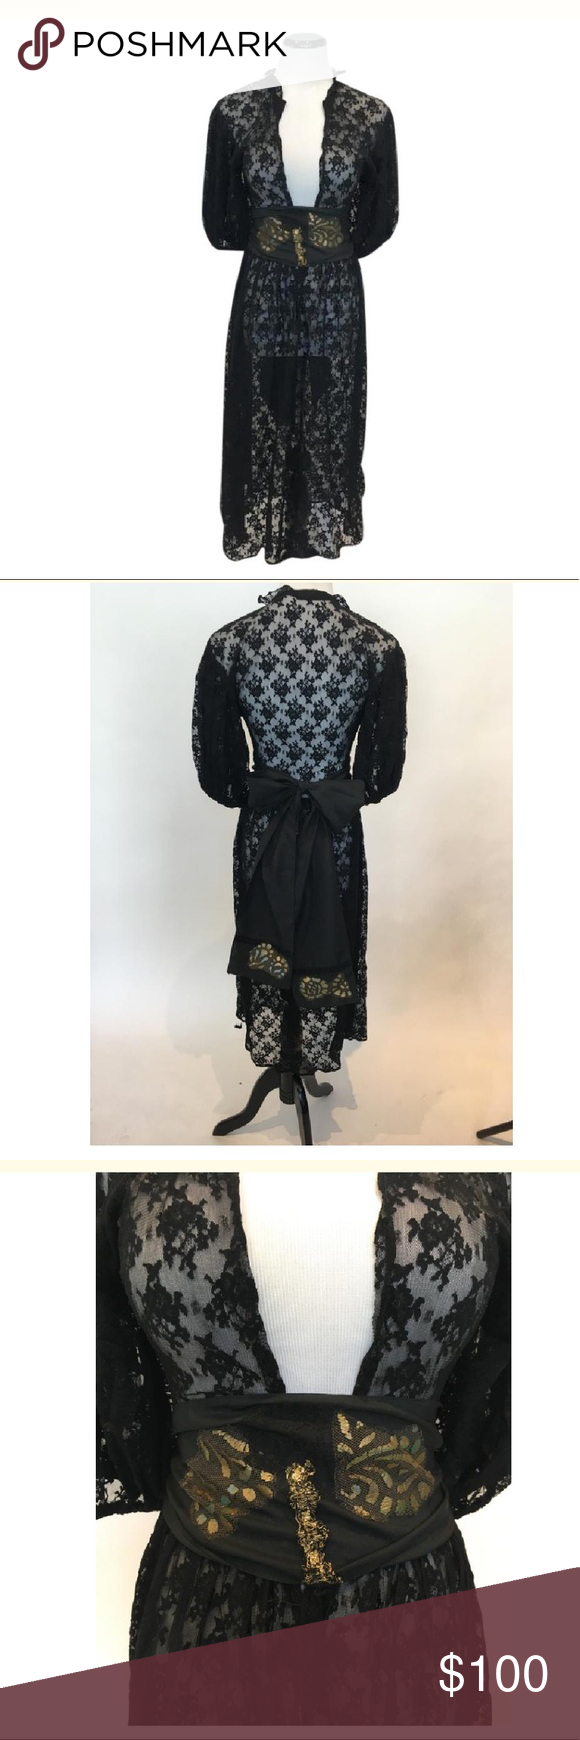 Bergdorf goodman black lace dress lace long dresses lace dress